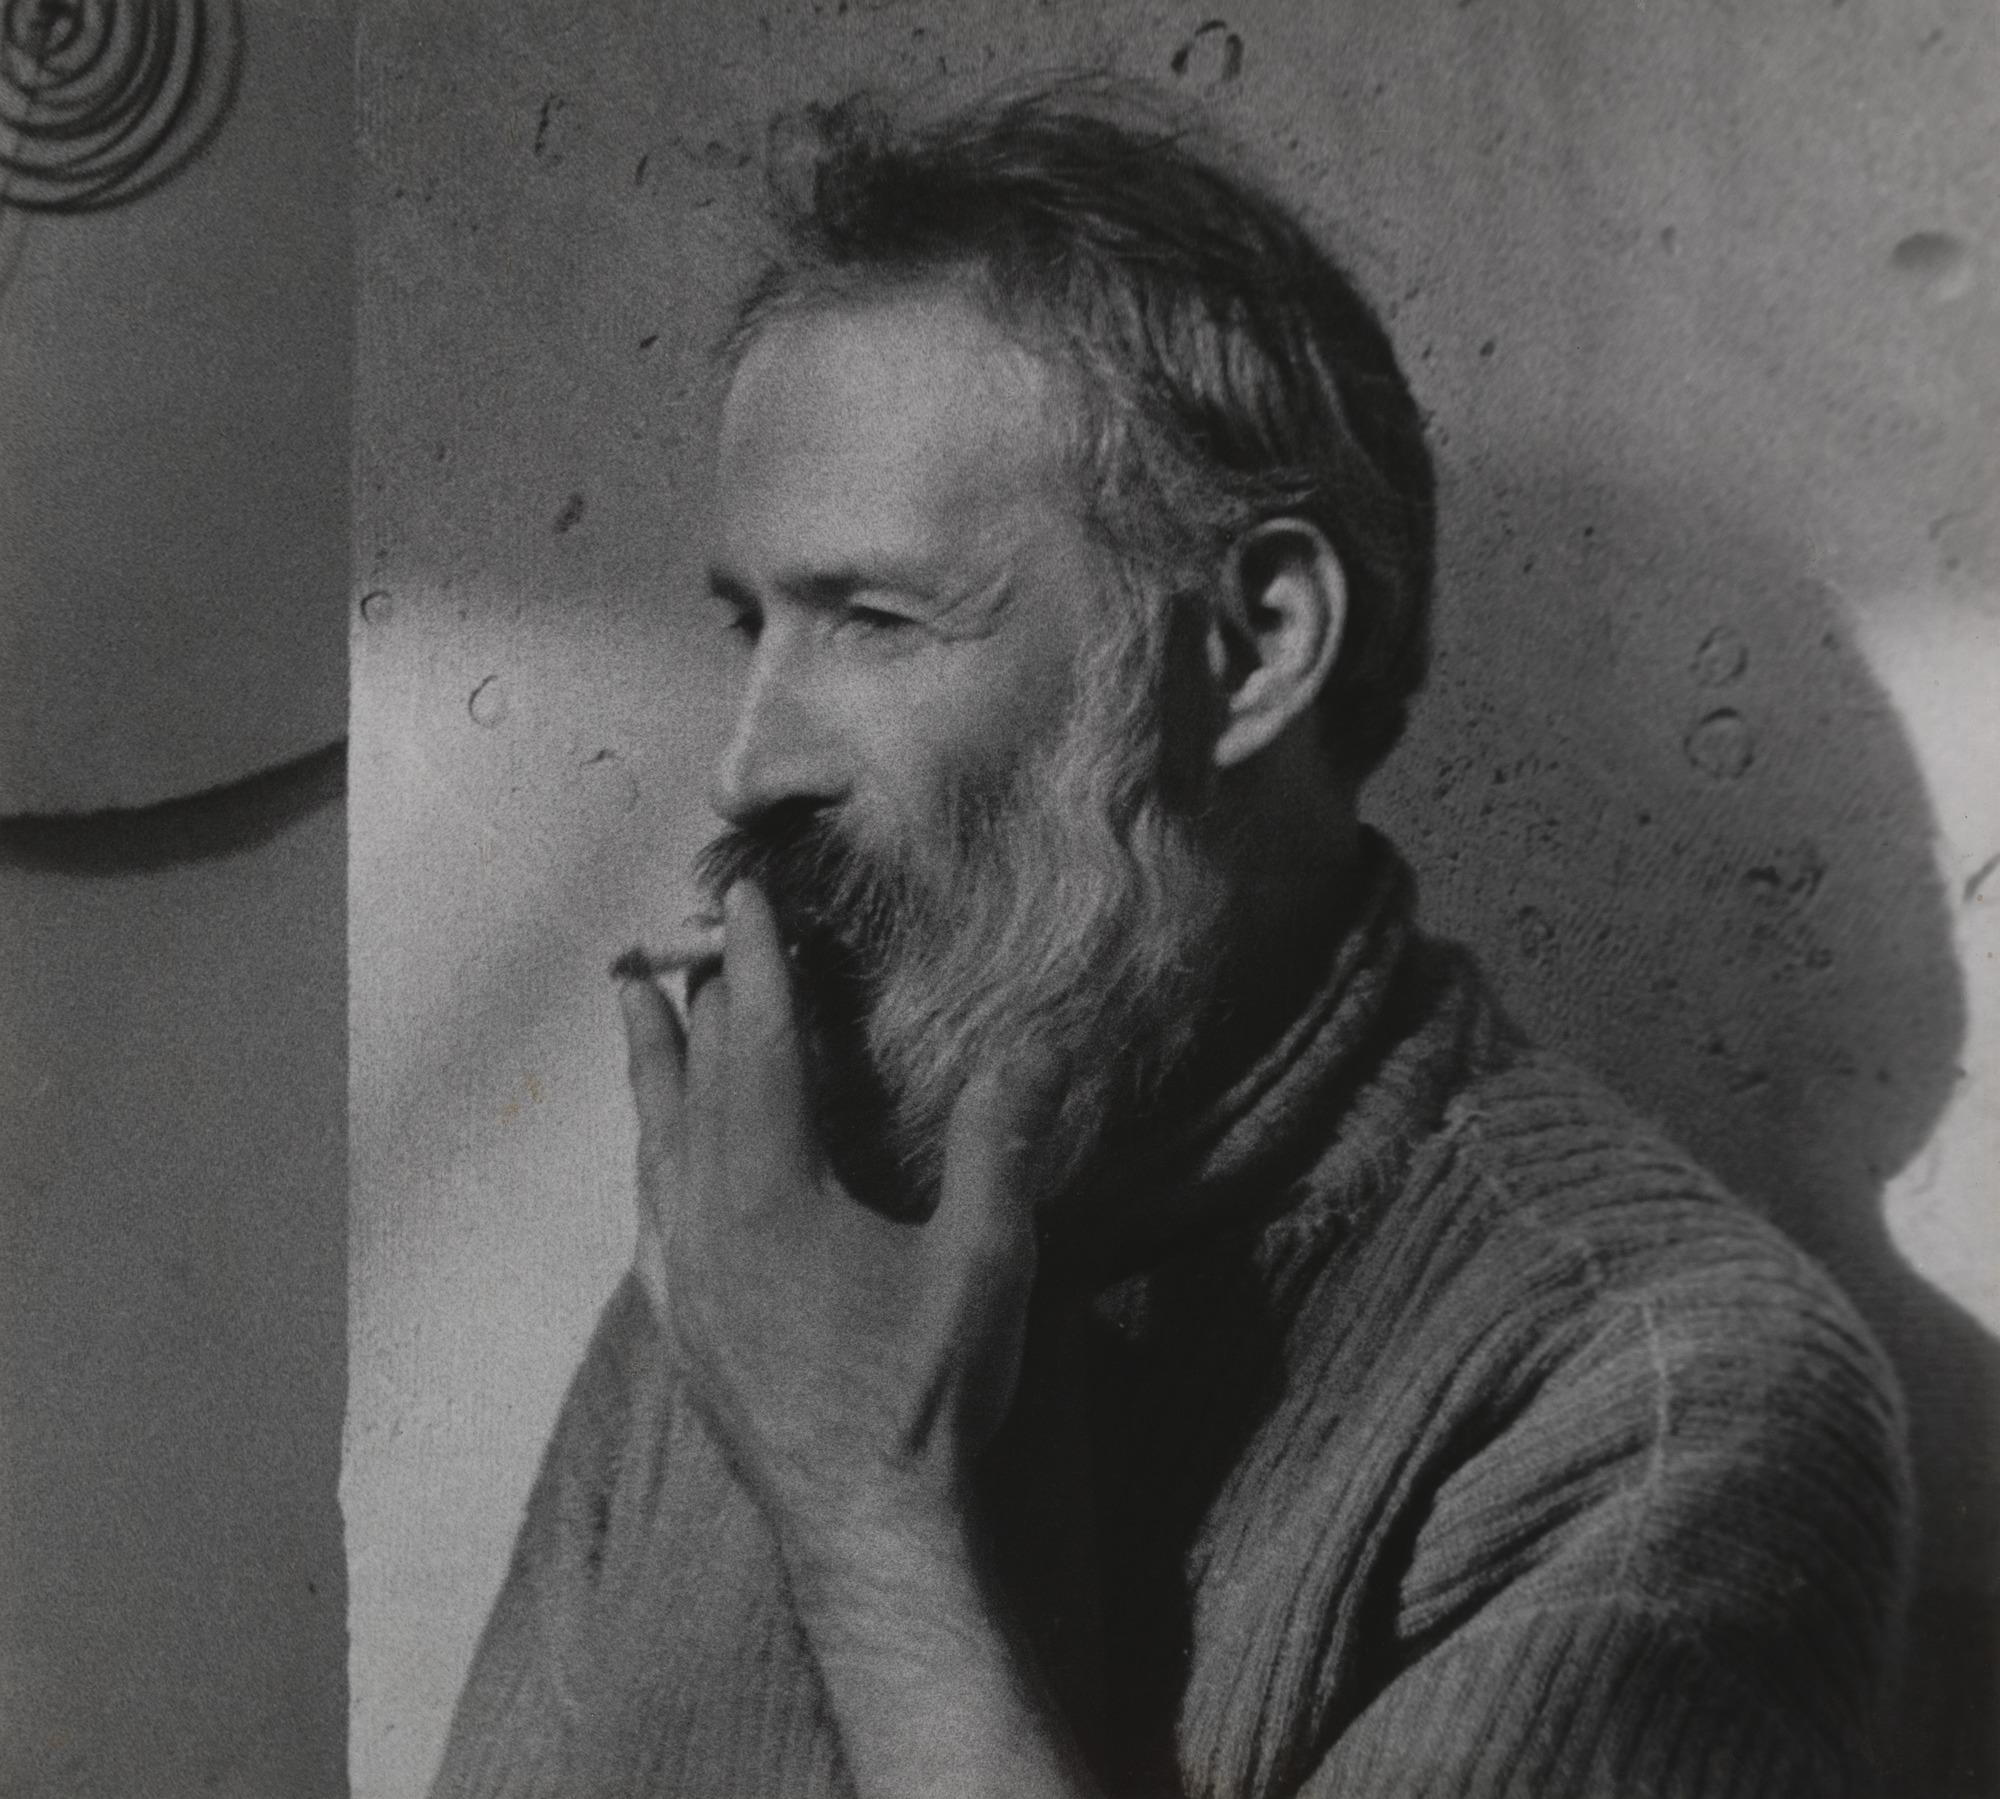 Constantin Brancusi, fotografie facura de Man Ray, MoMa